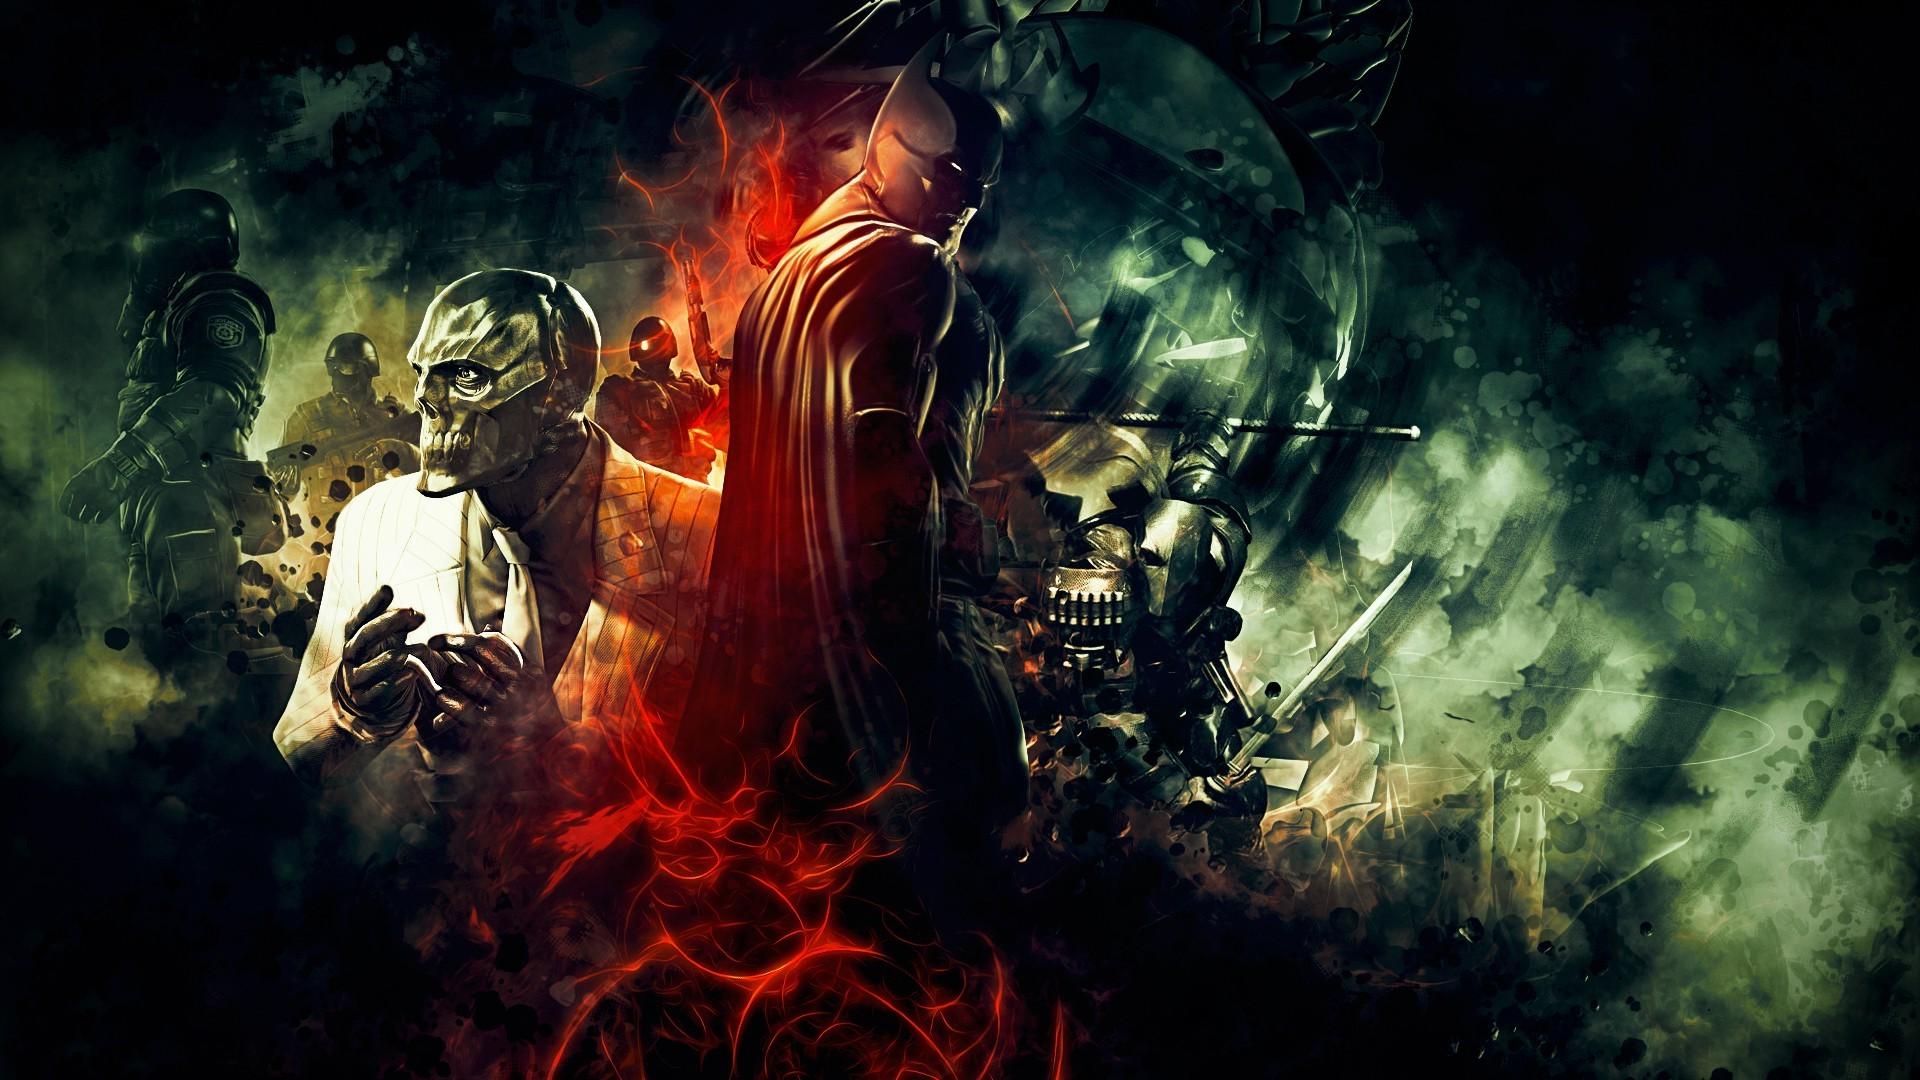 Video Games Batman Deathstroke Black Mask Arkham Origins Darkness Screenshot 1920x1080 Px Computer Wallpaper Special